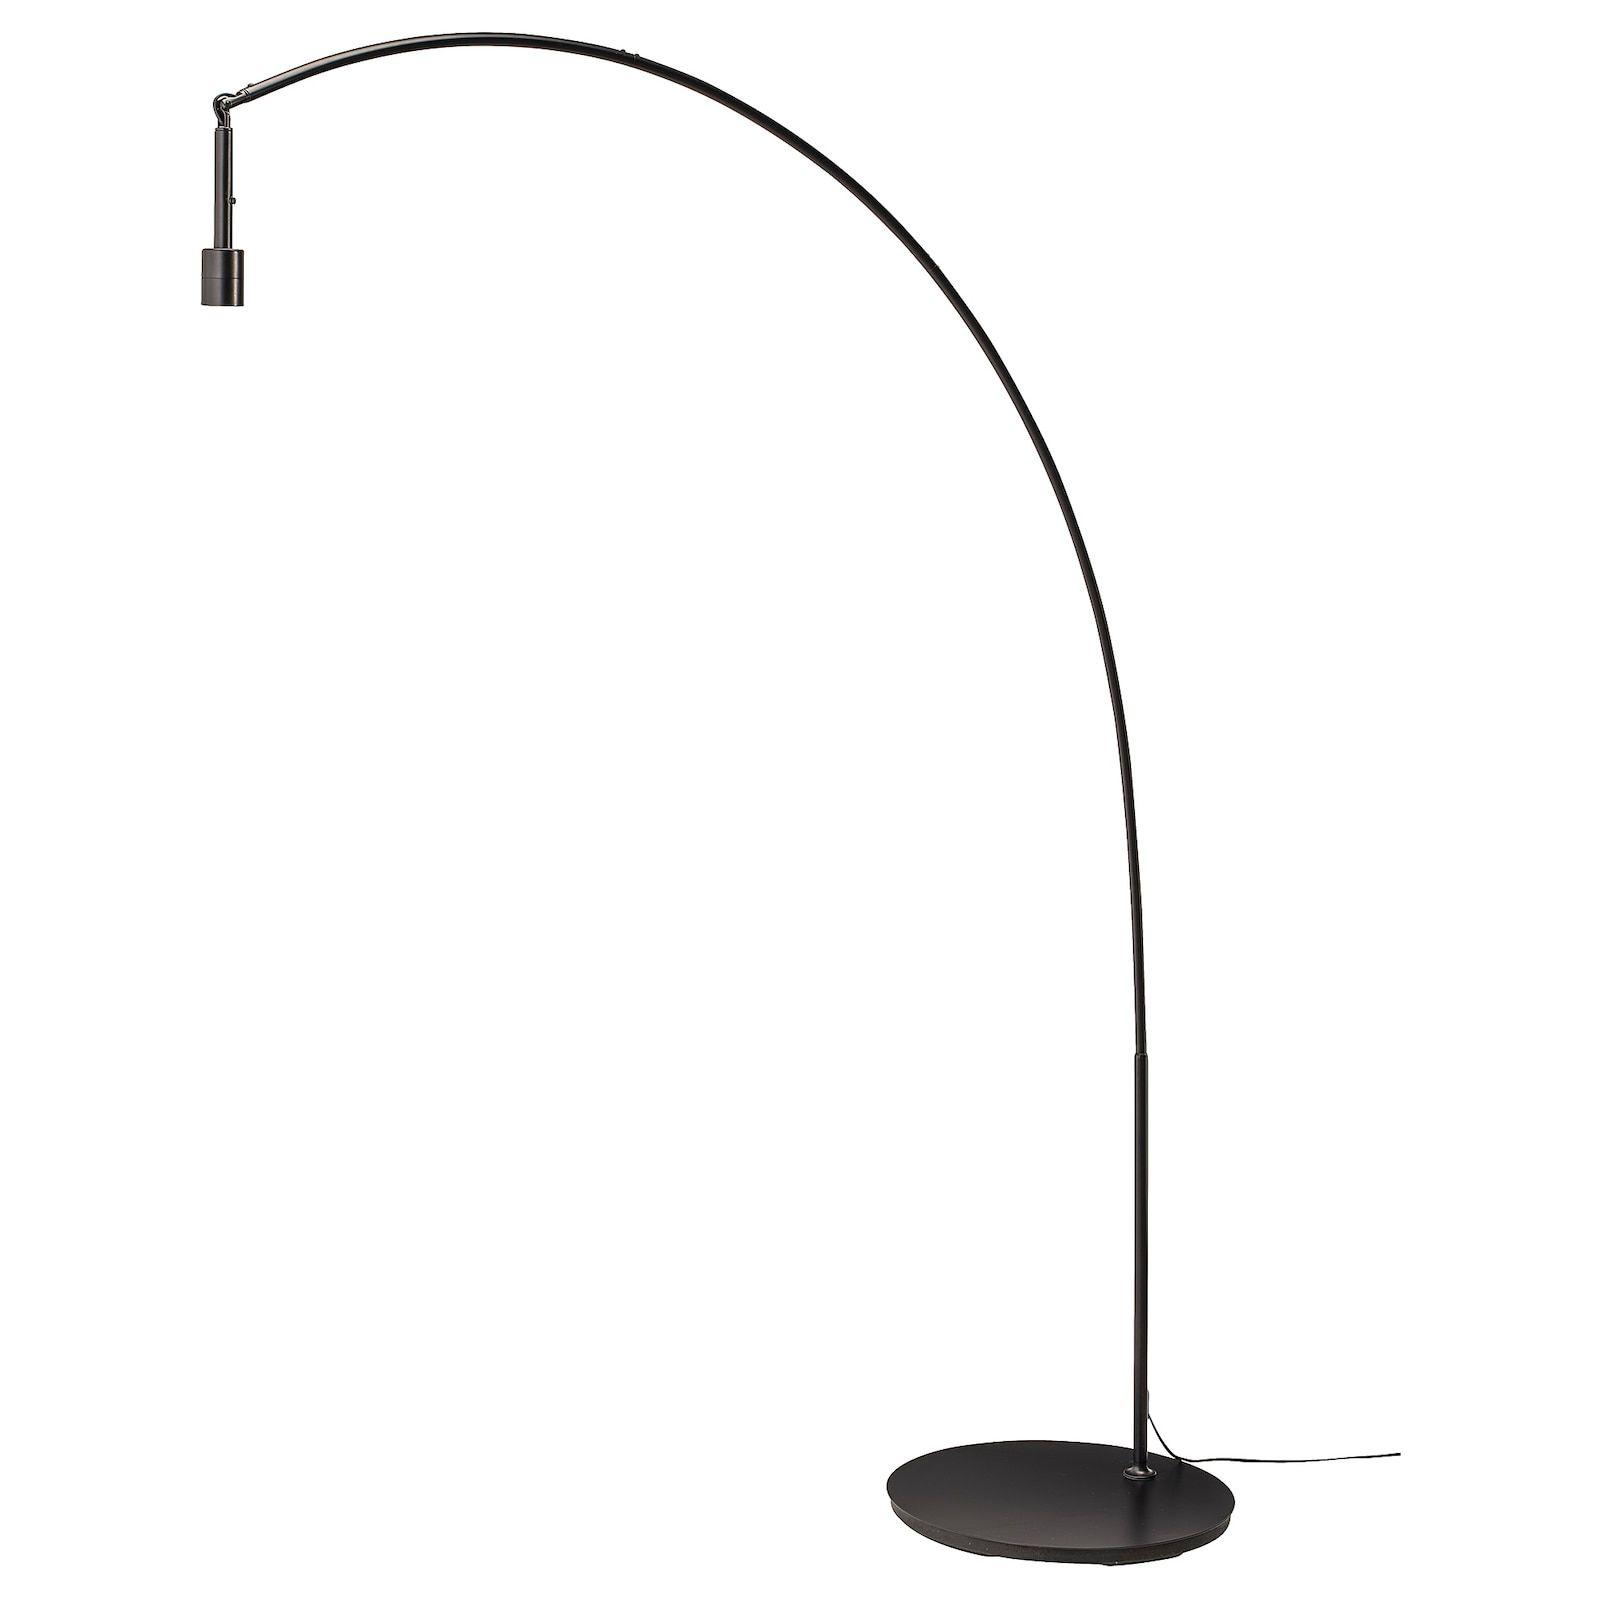 Skaftet Pied Lampadaire Arceau Noir Noir Ikea V 2020 G Torshery Lampa Napolnye Svetilniki